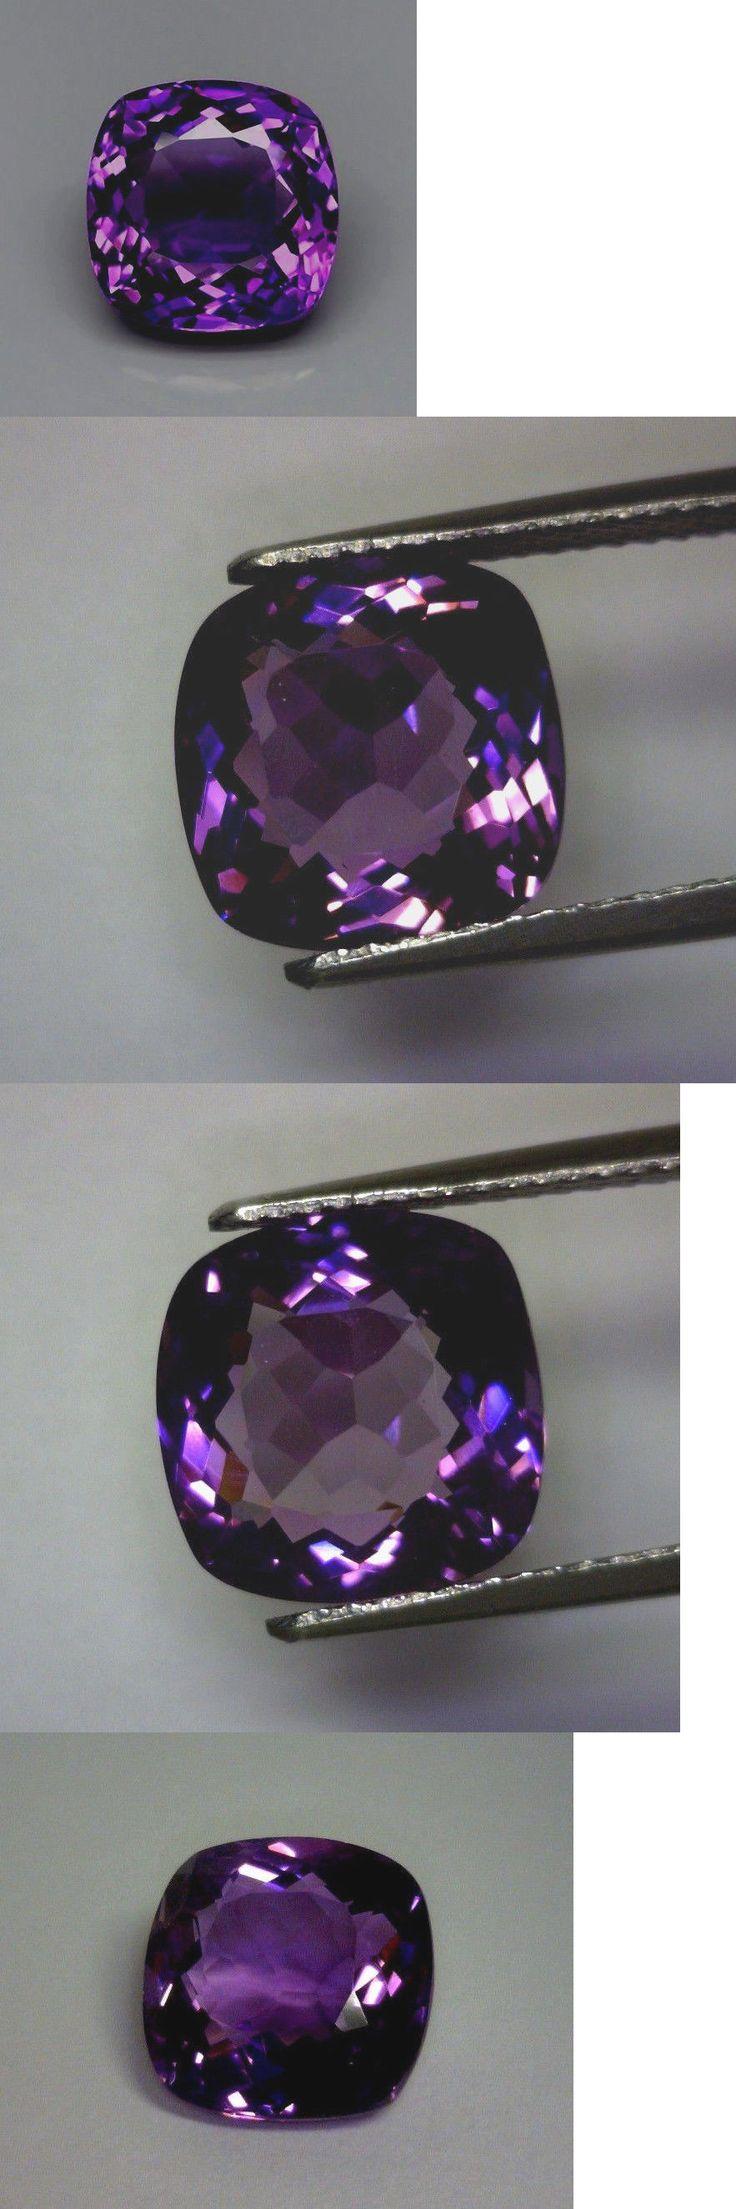 Amethyst 10192: 7.72 Ct Natural Cushion Cut Amethyst, Rich Purple, Vs, Uruguay -> BUY IT NOW ONLY: $93.5 on eBay!